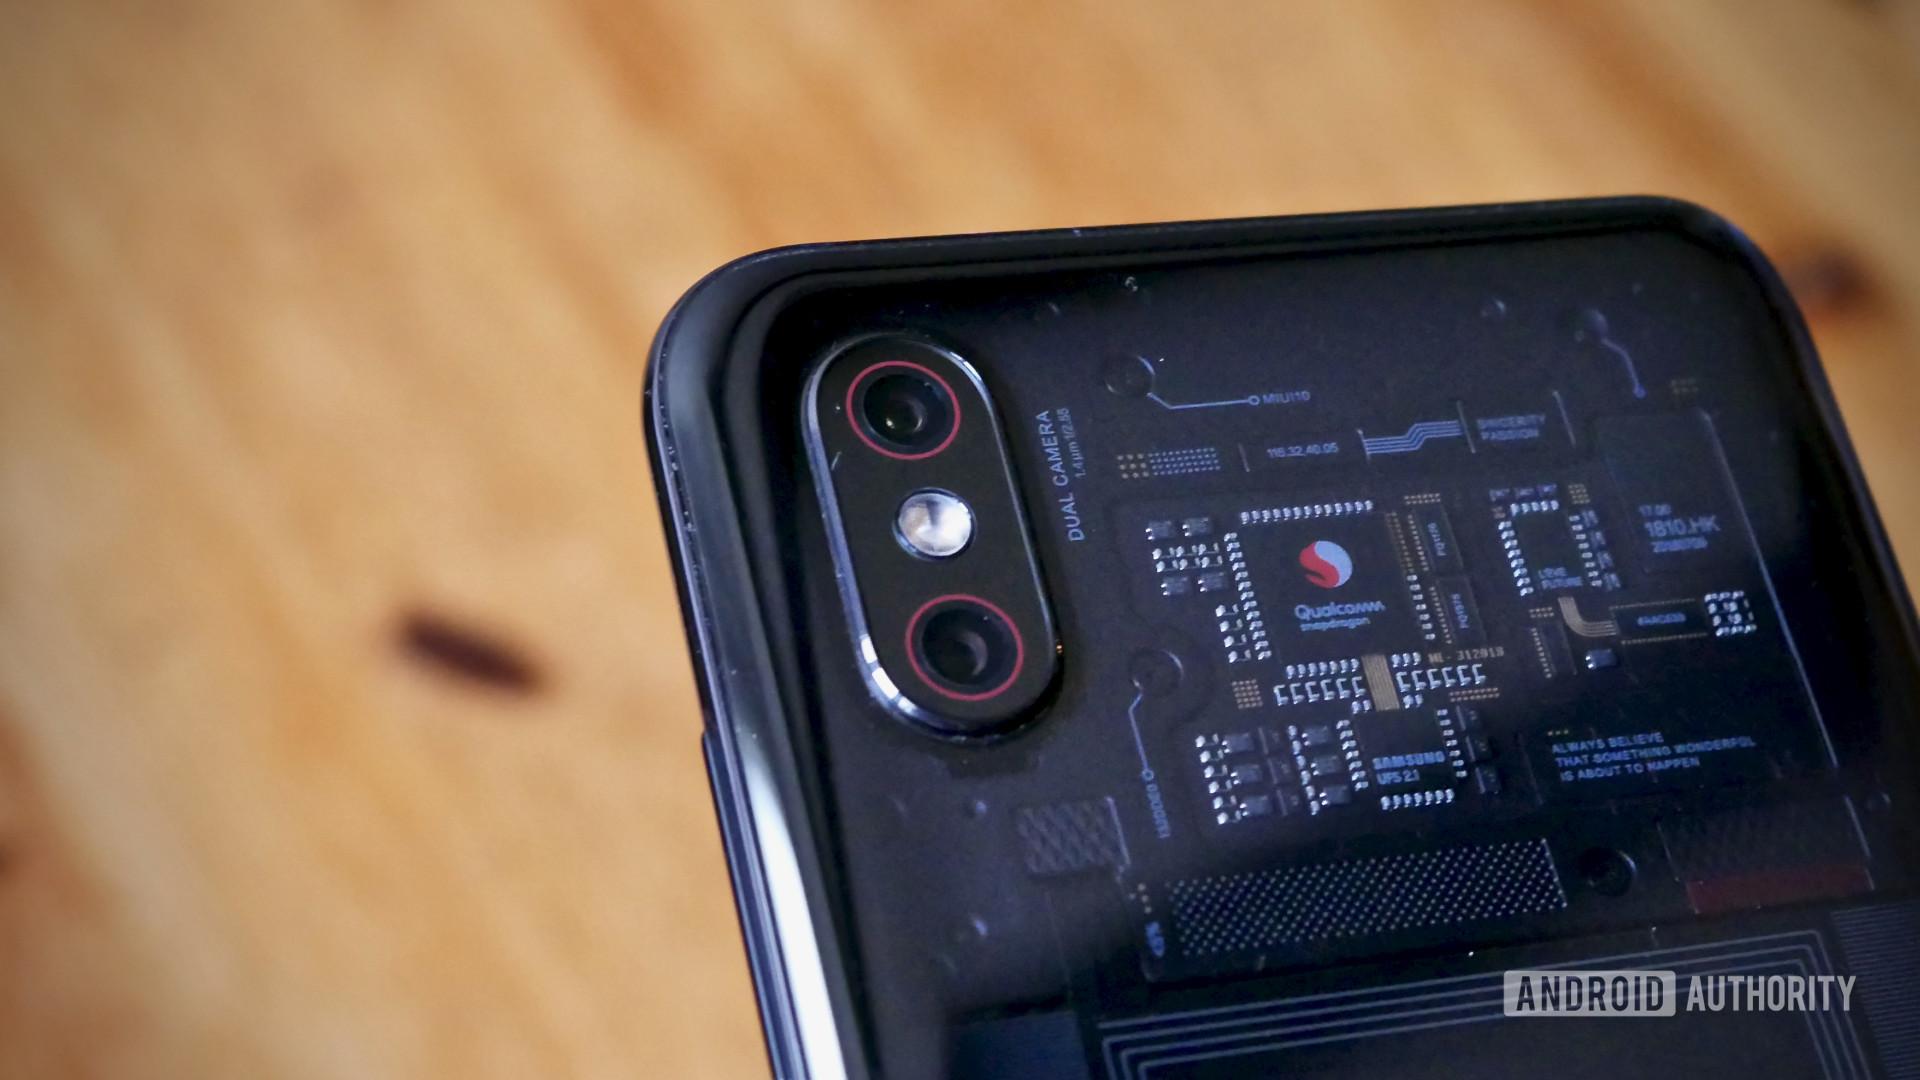 Xiaomis Next Smartphone Might Feature A 48 Megapixel Camera